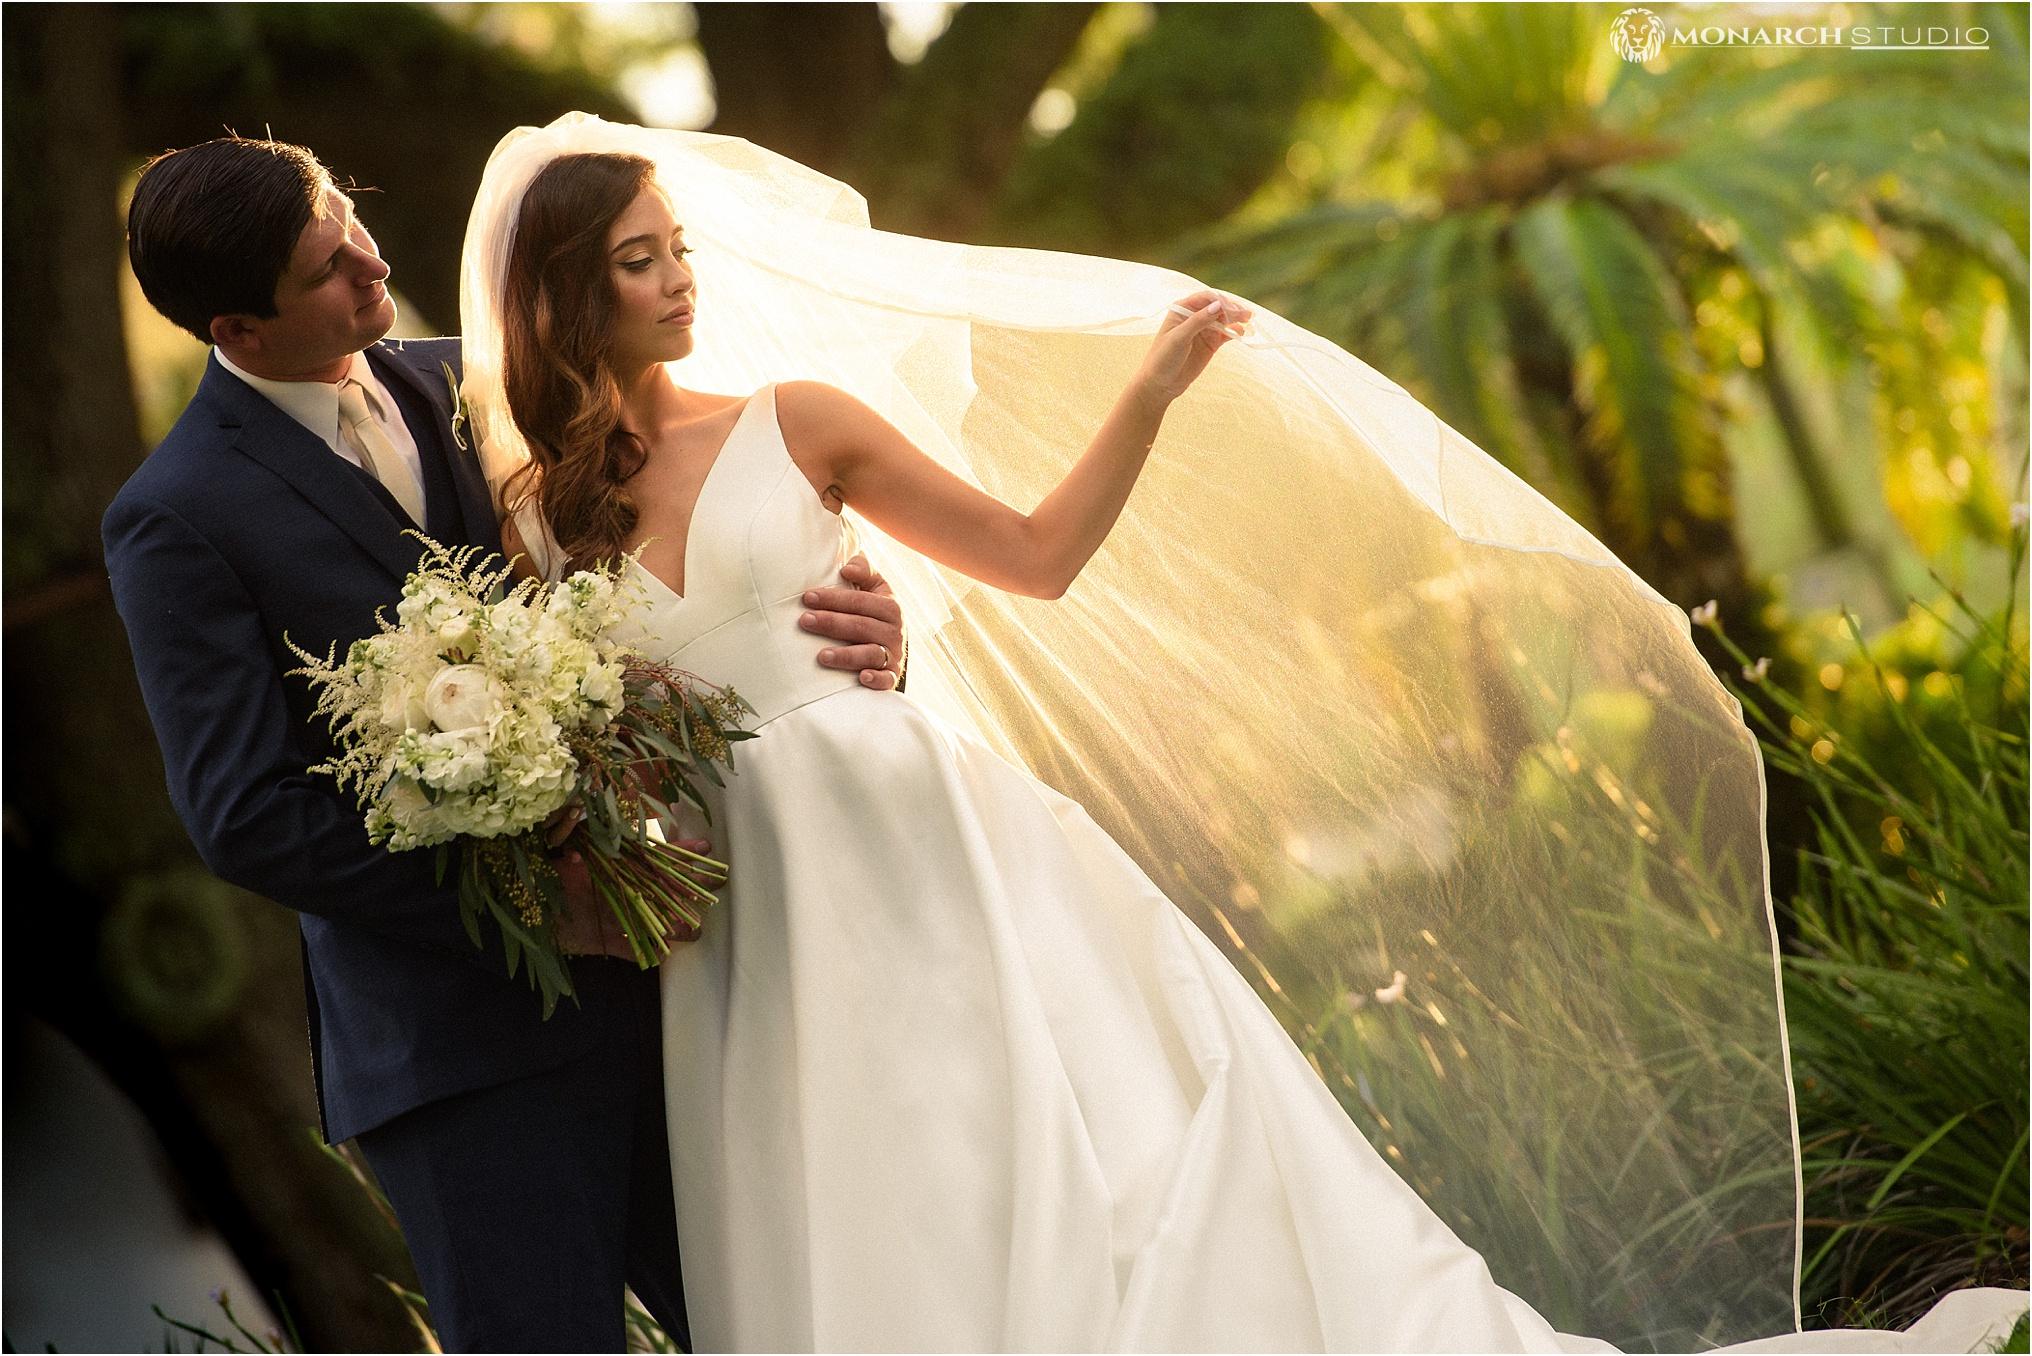 st-augustine-wedding-photographer-094.jpg